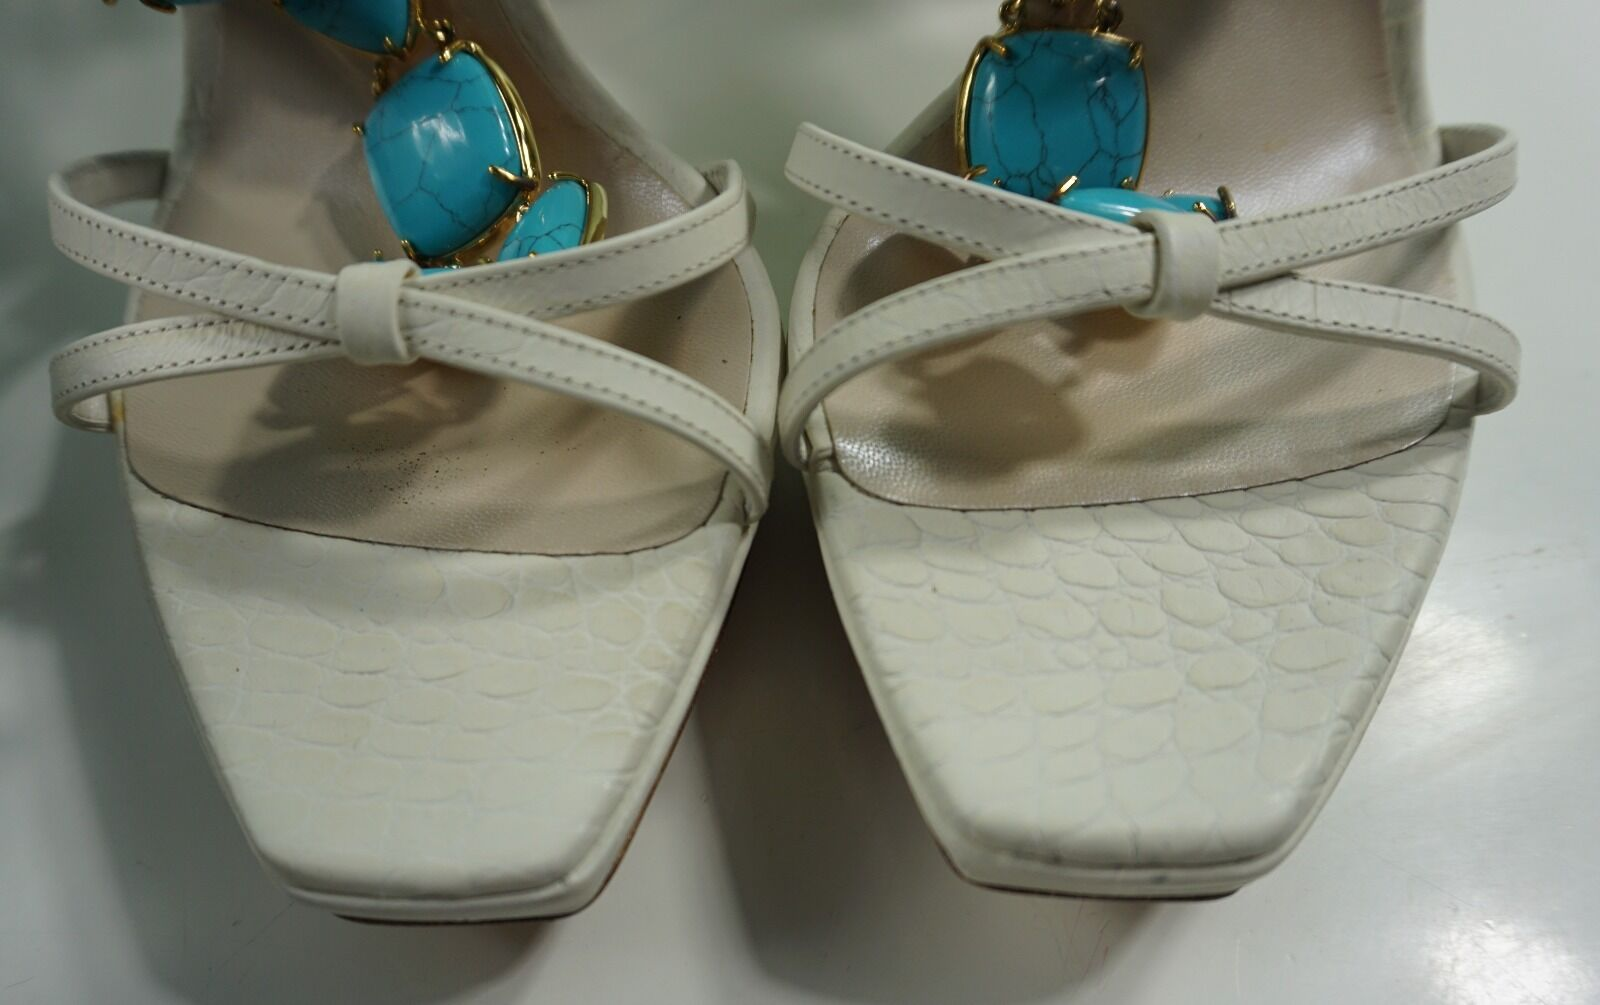 NIB Christian Christian Christian Dior White Piedra sandals, size 38 d8bef2